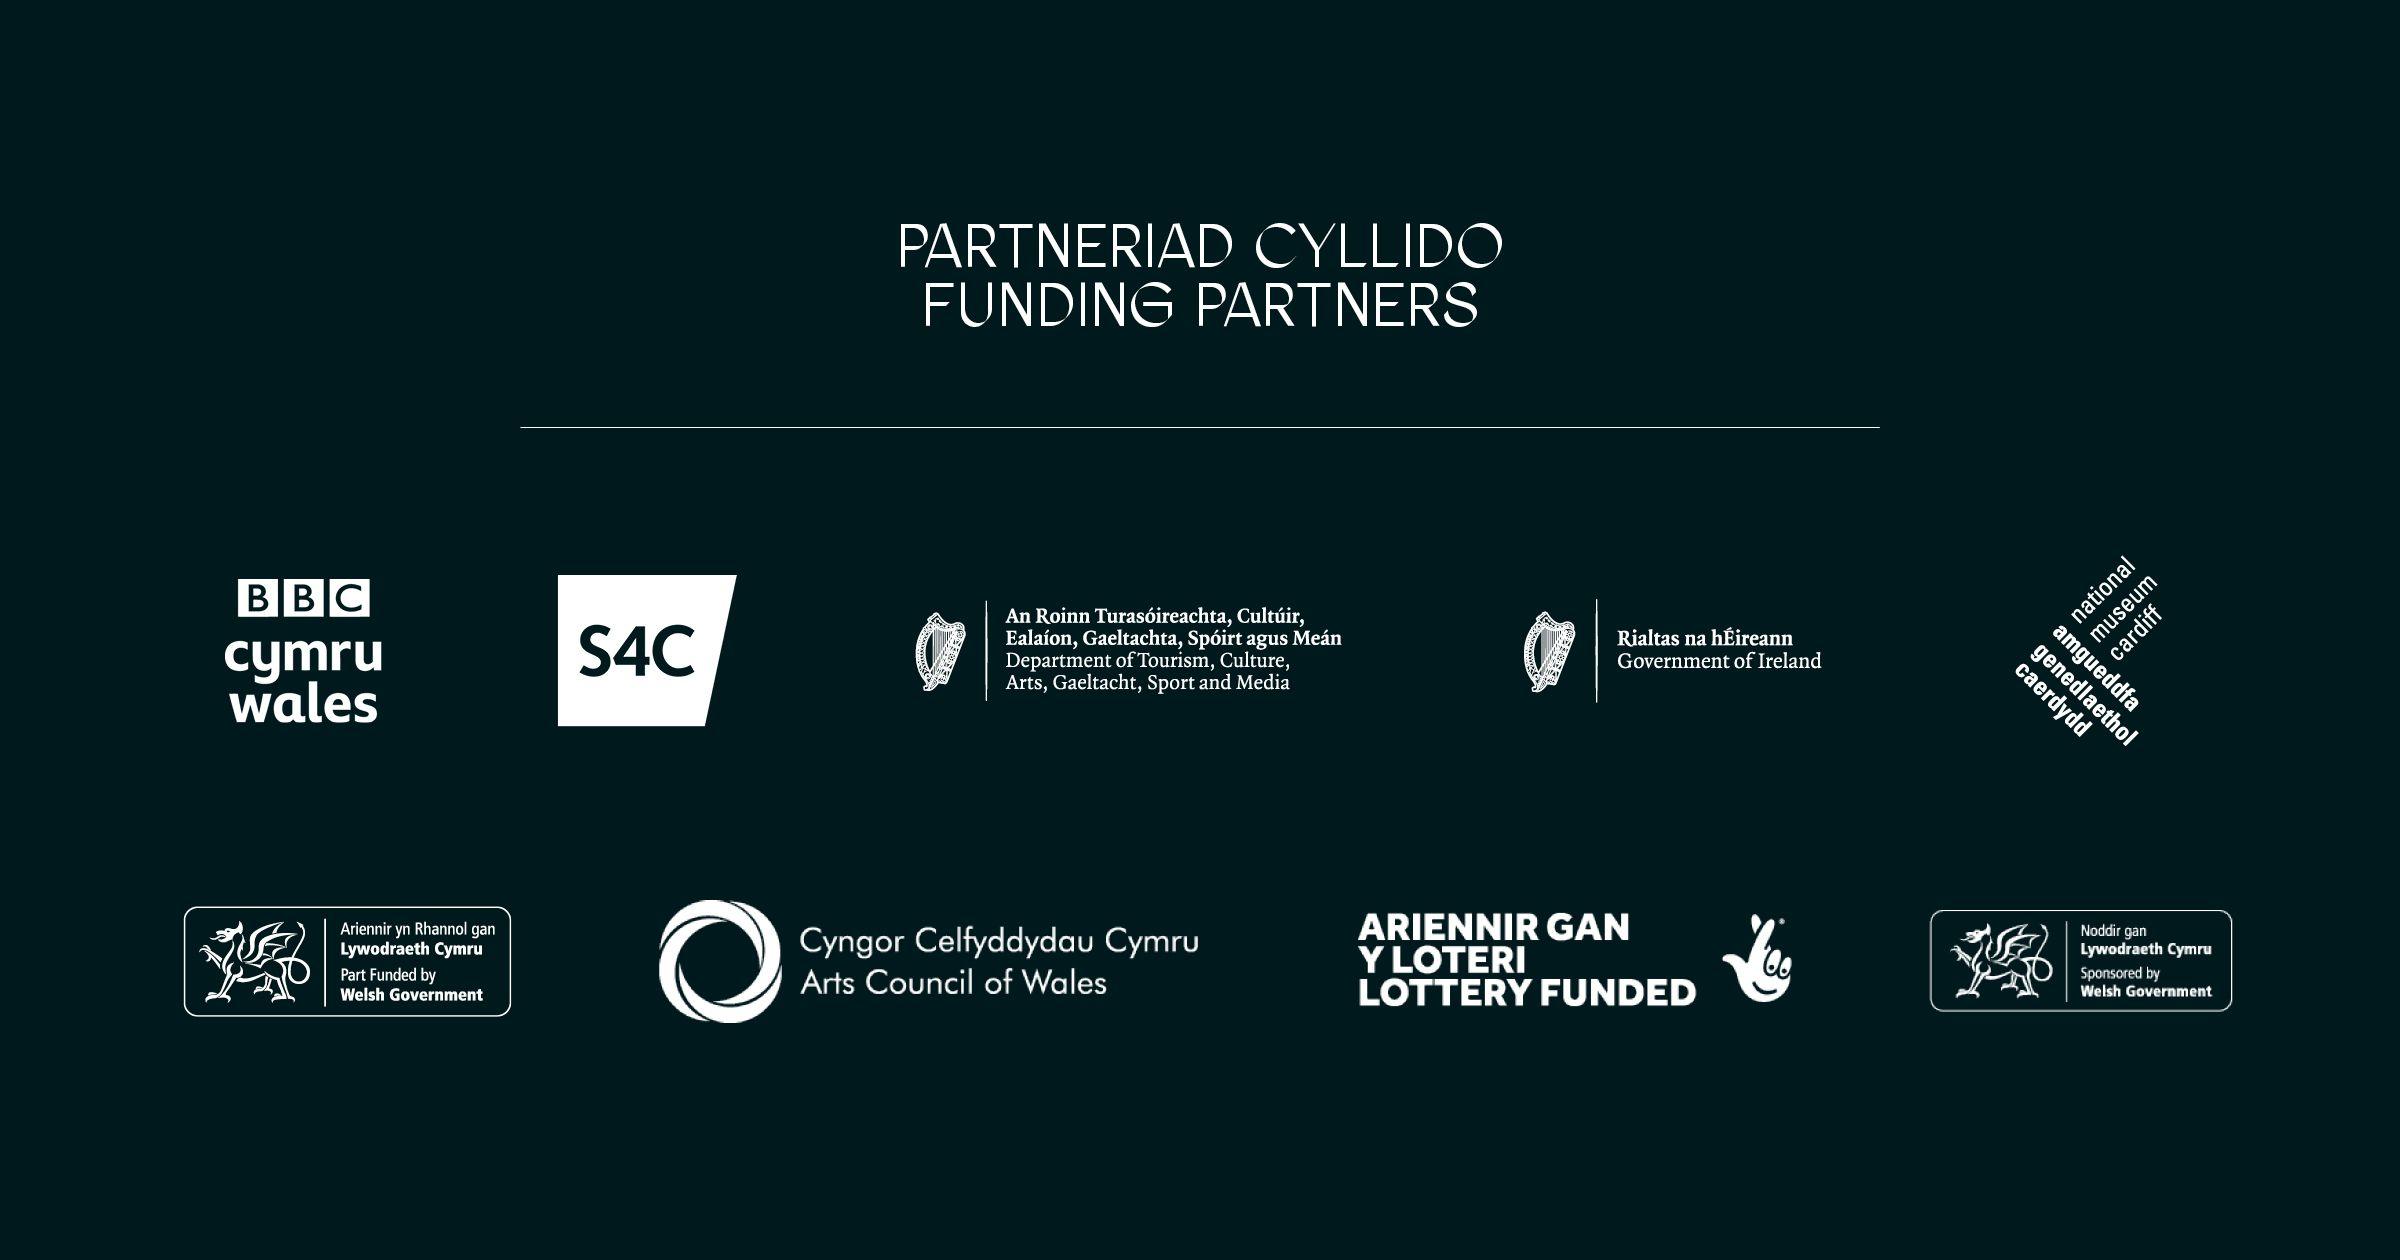 Funding partners